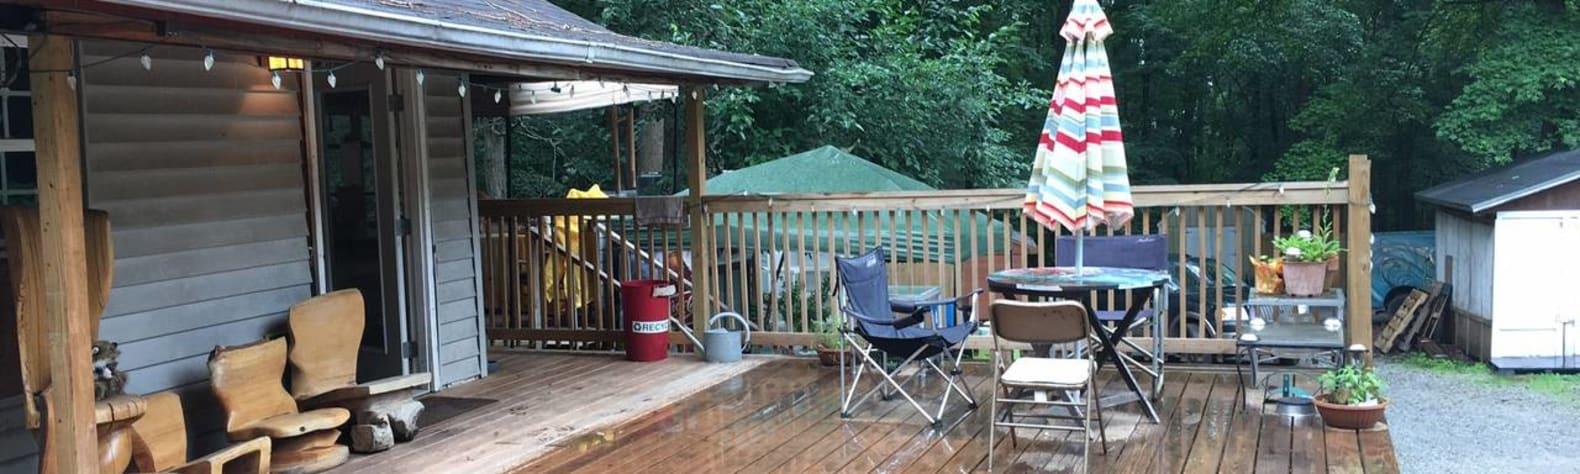 LEAF Urban Cabin Camping